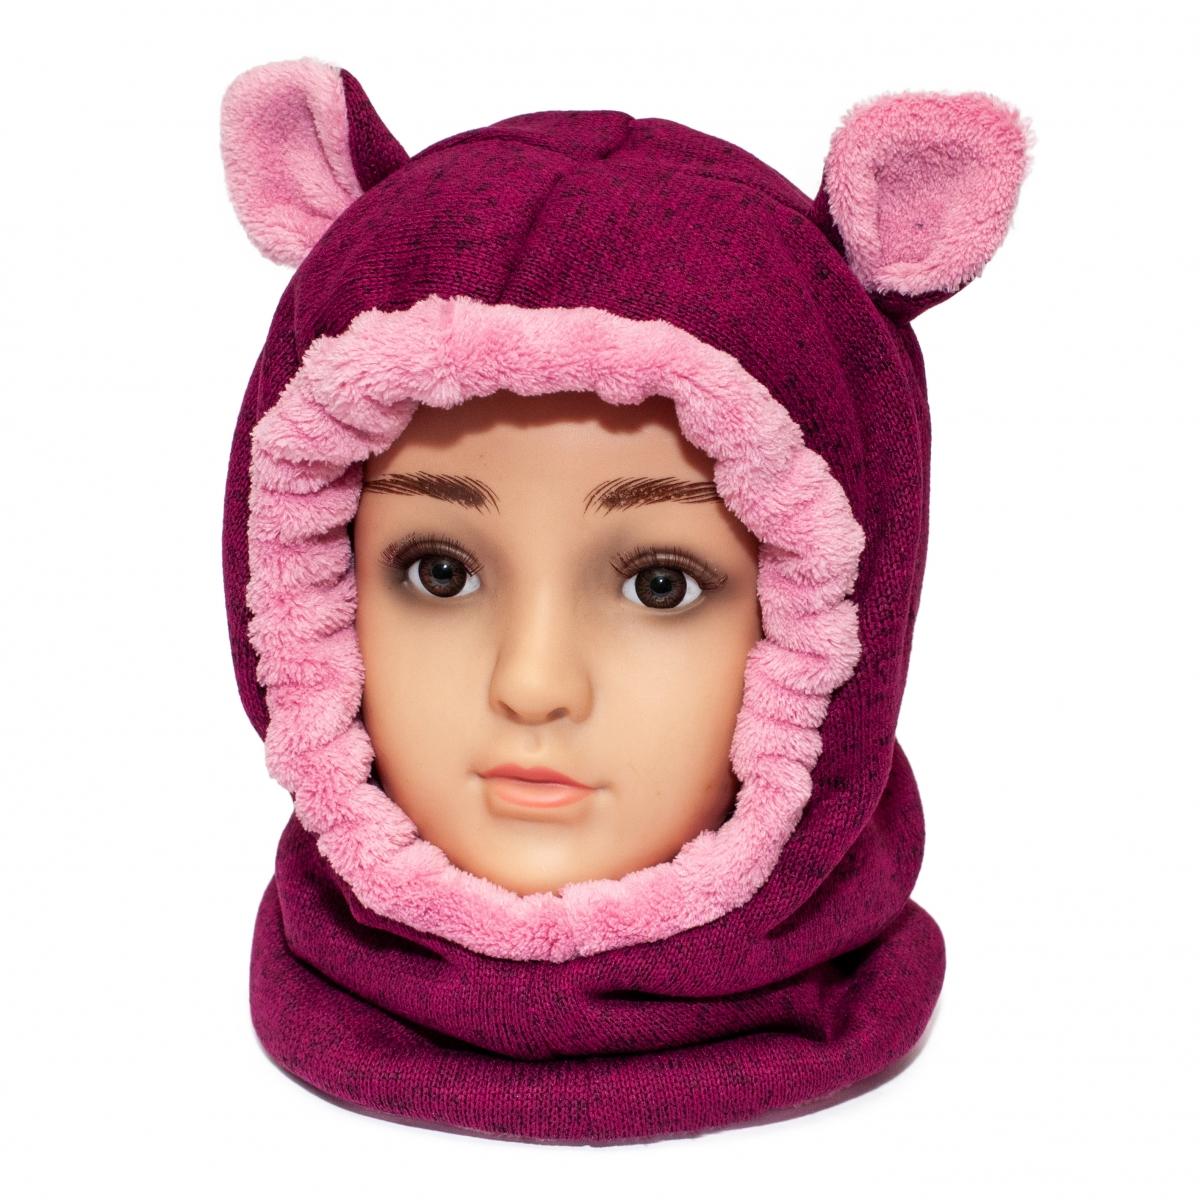 Cagula fete de iarna G5 grena roz 1-5ani